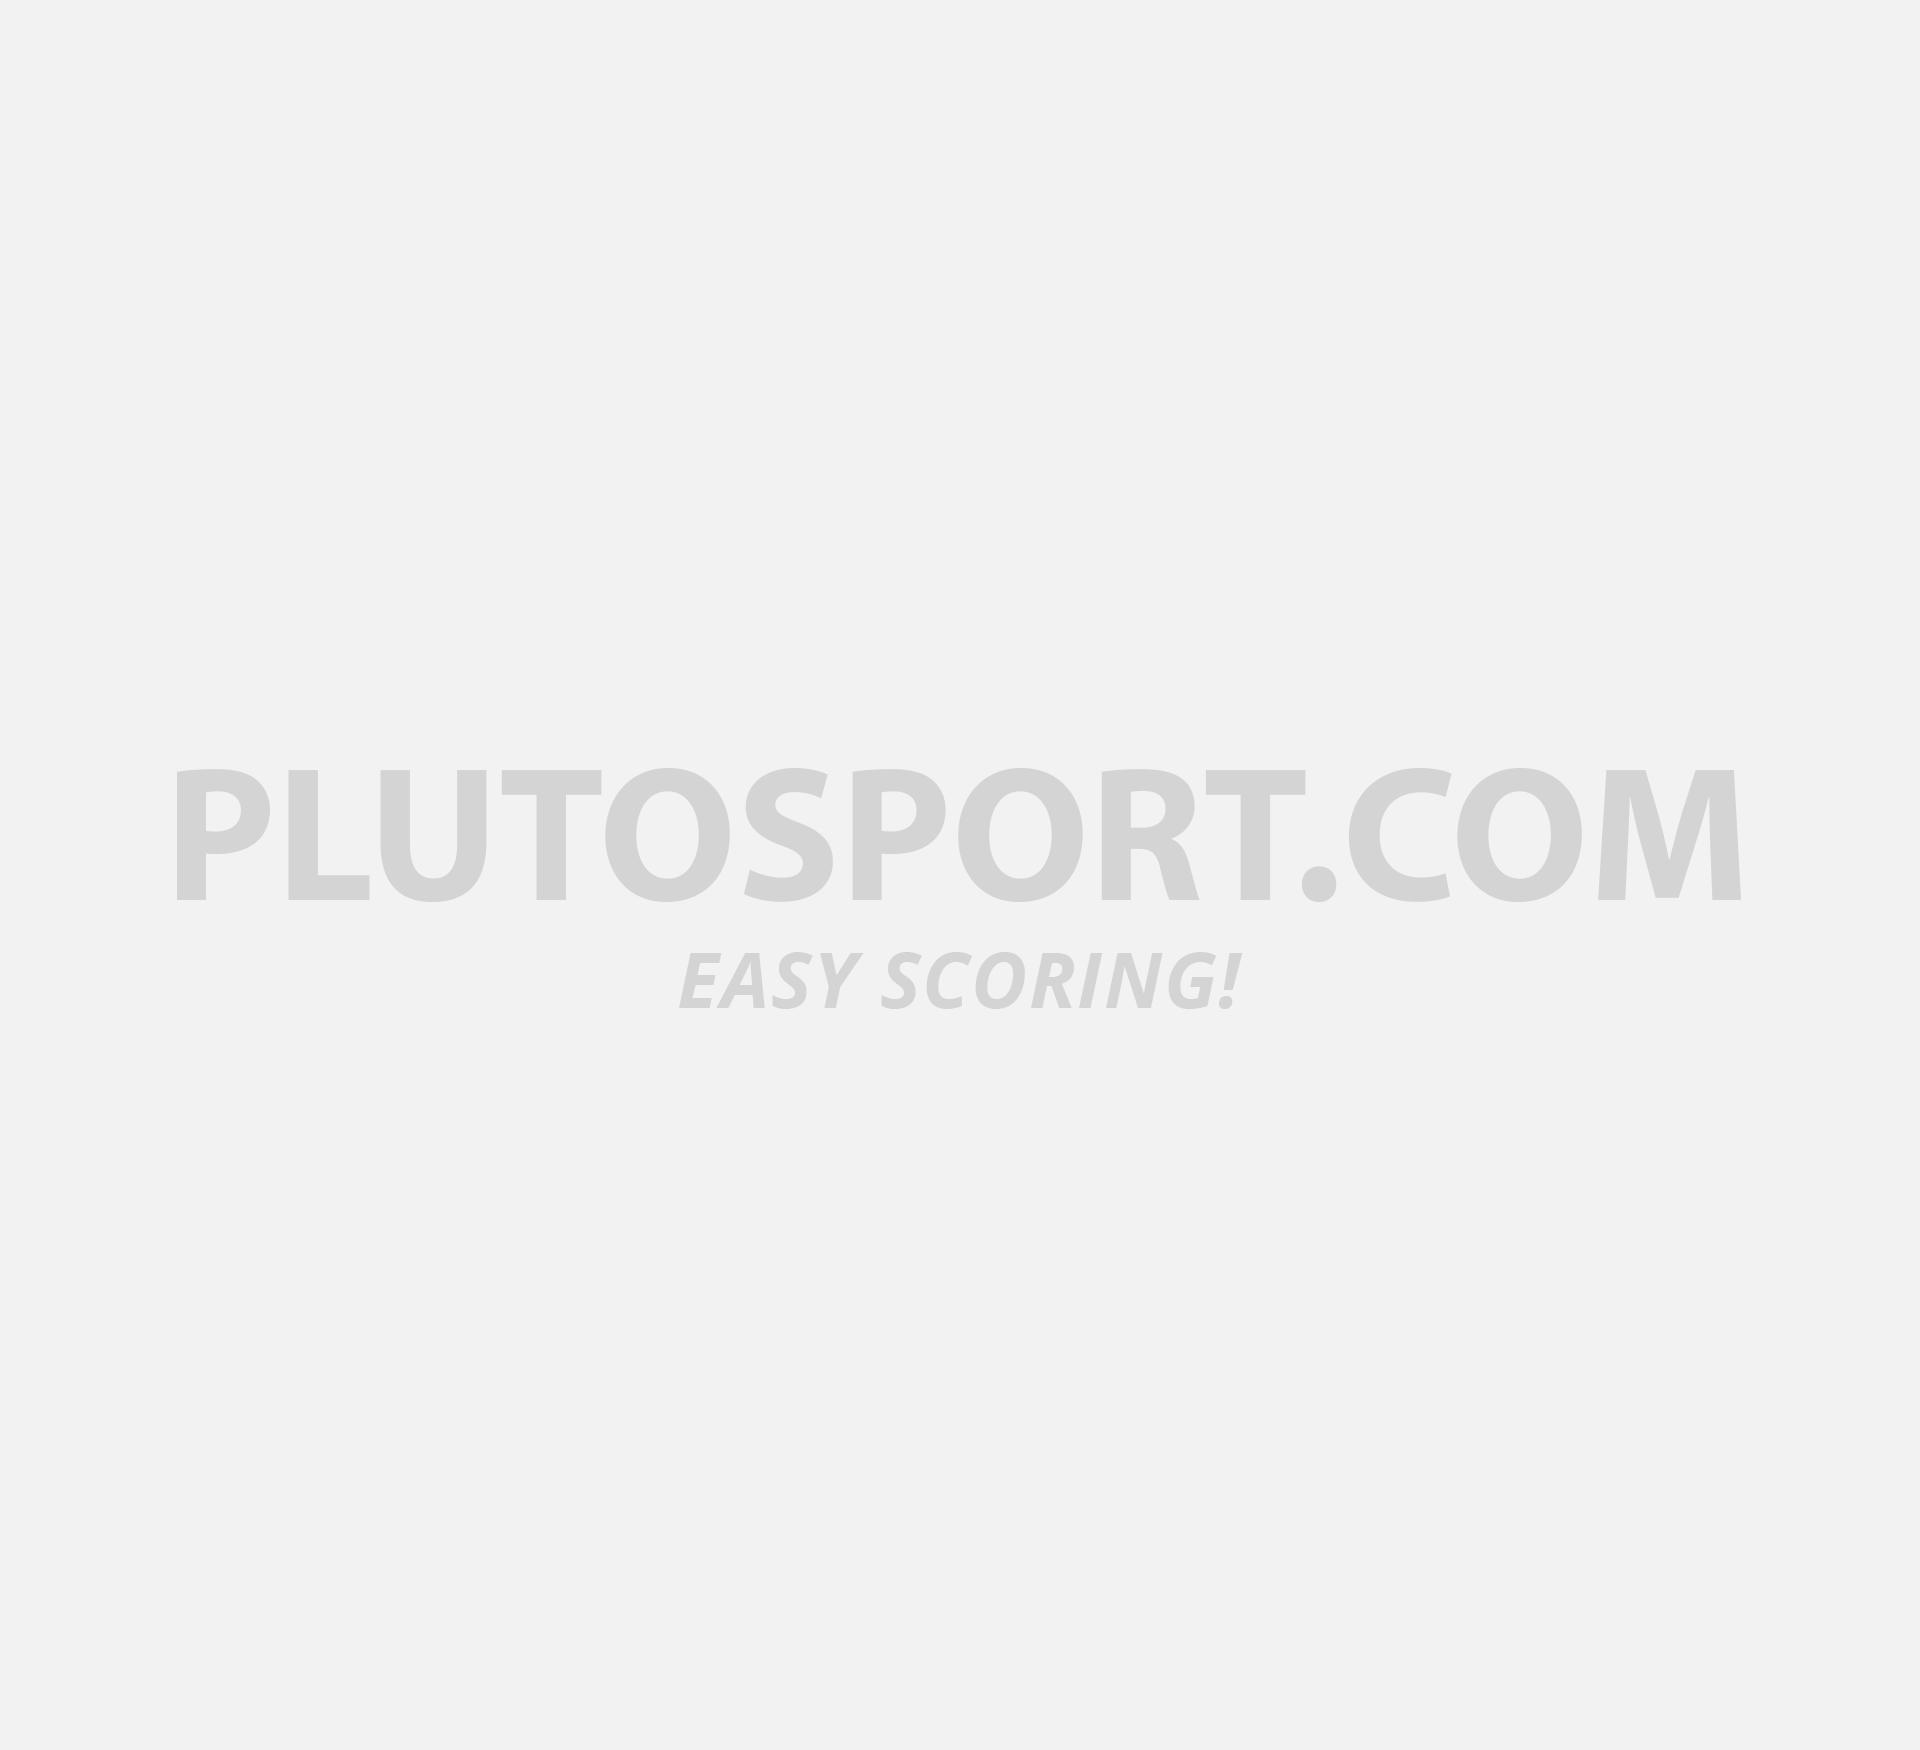 Asics Gel-Blackheath 5 Hockeyshoes Wms